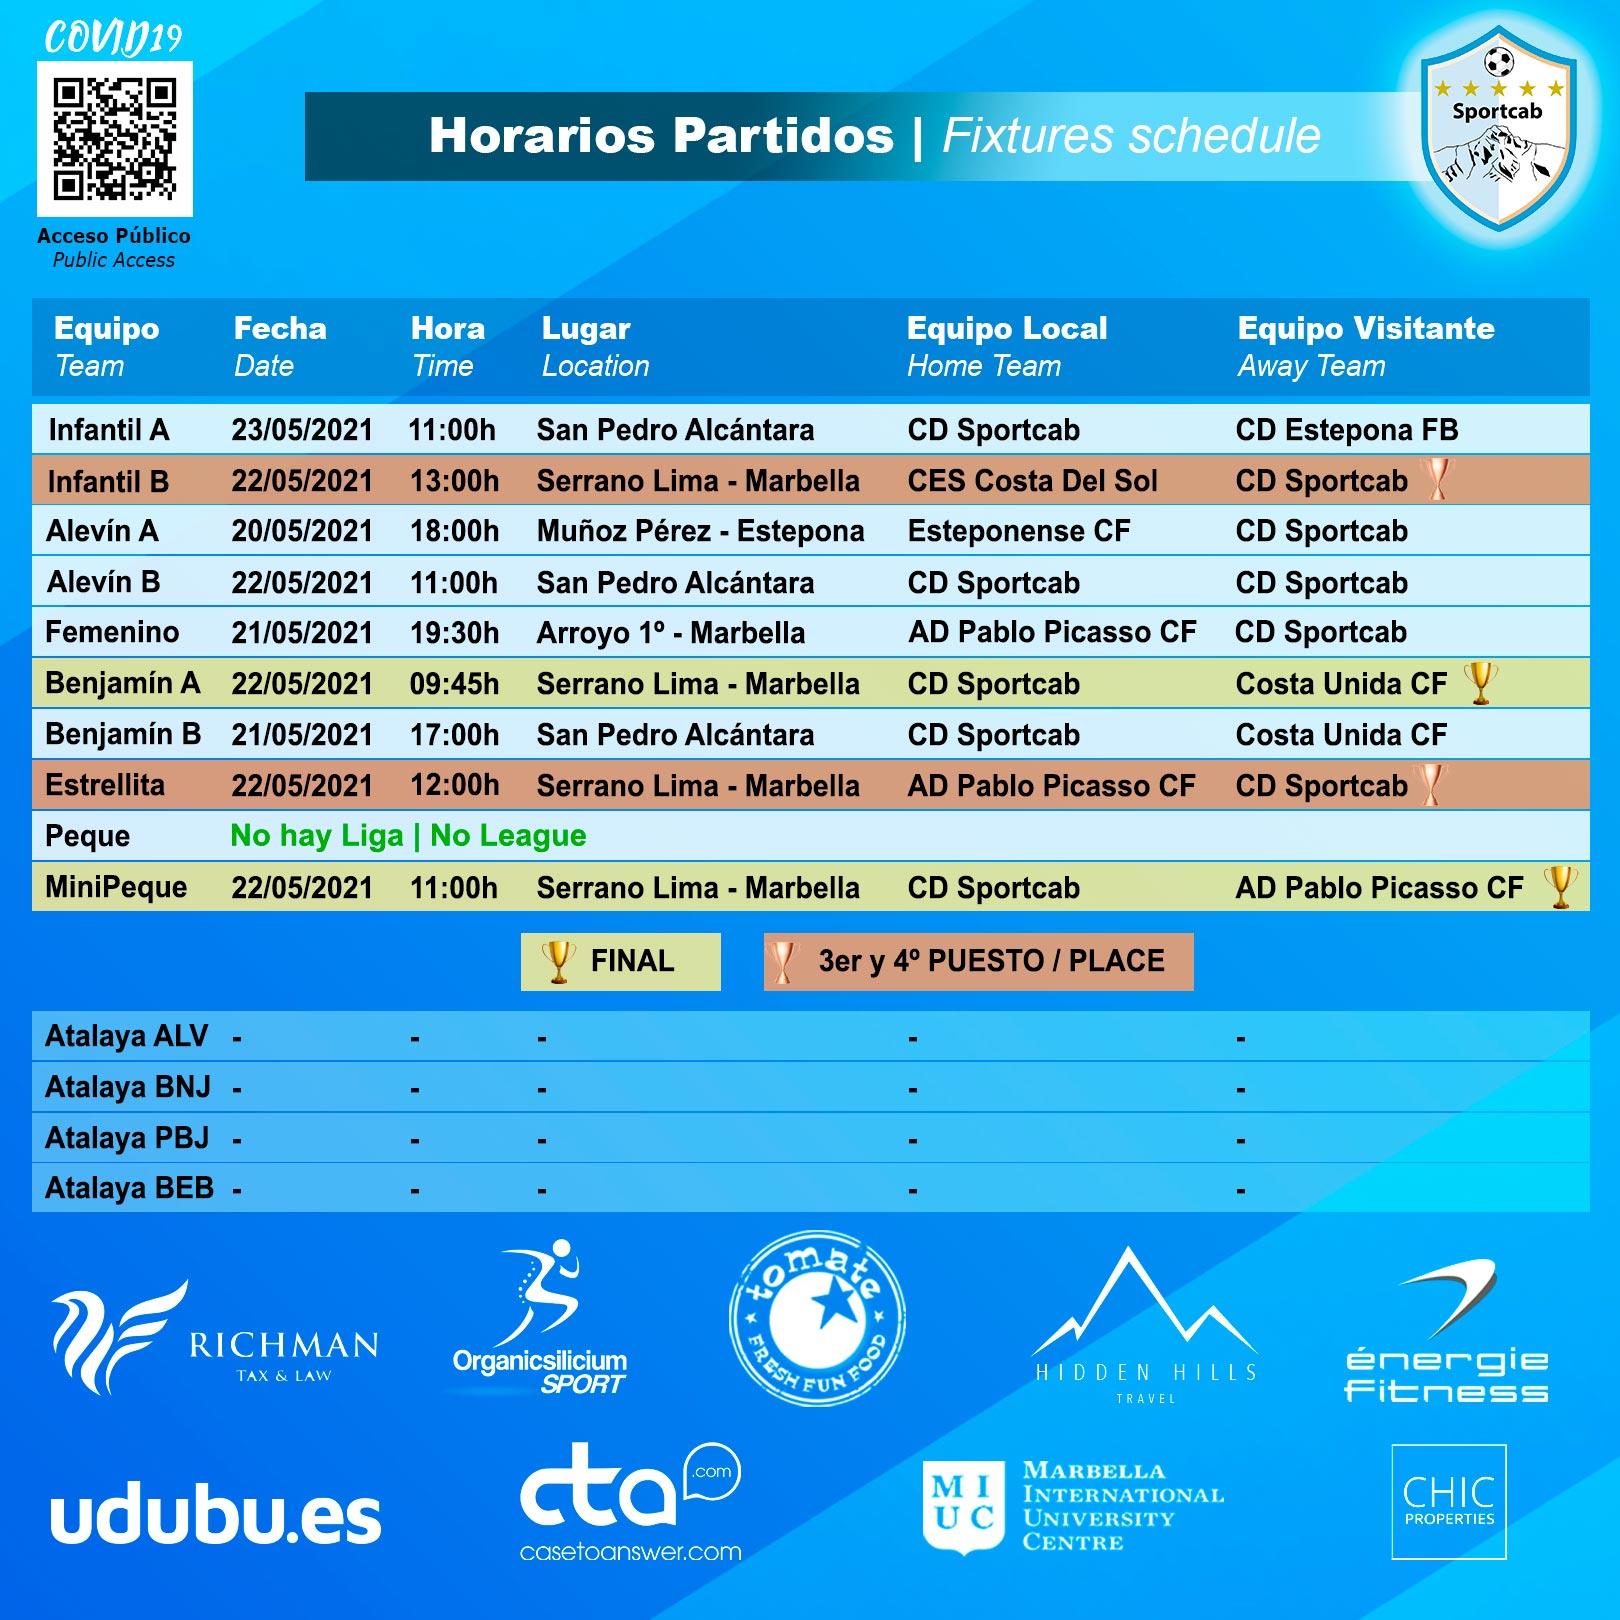 20210520---Horario-Partidos-LQ Sportcab